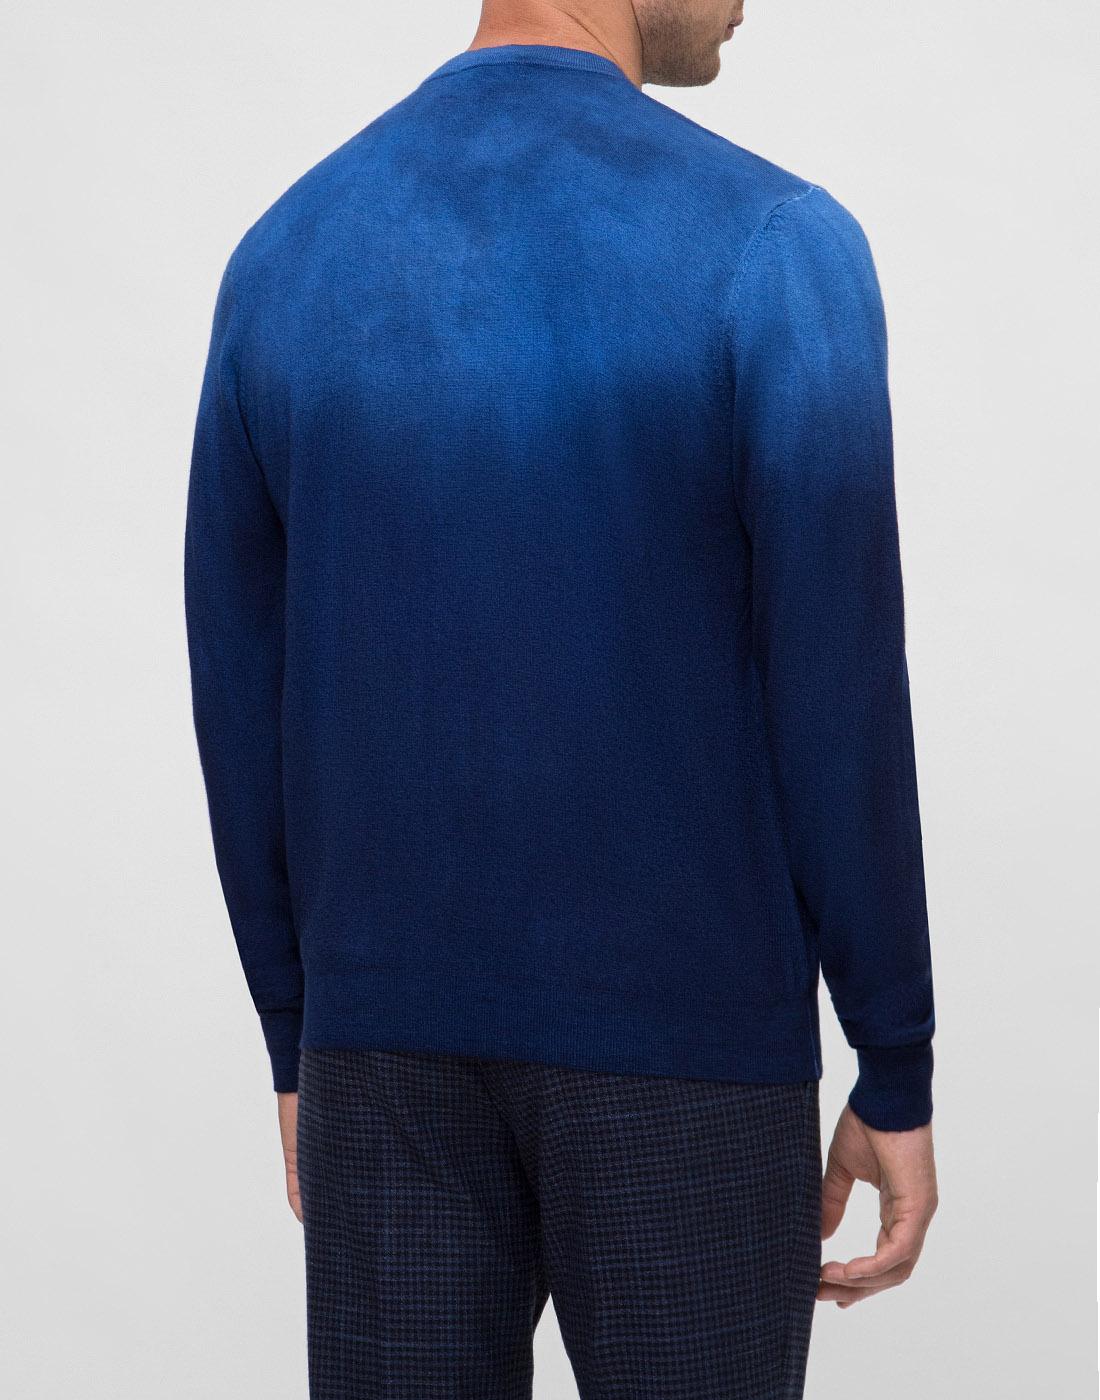 Мужской темно-синий джемпер  Bertolo S901638-4